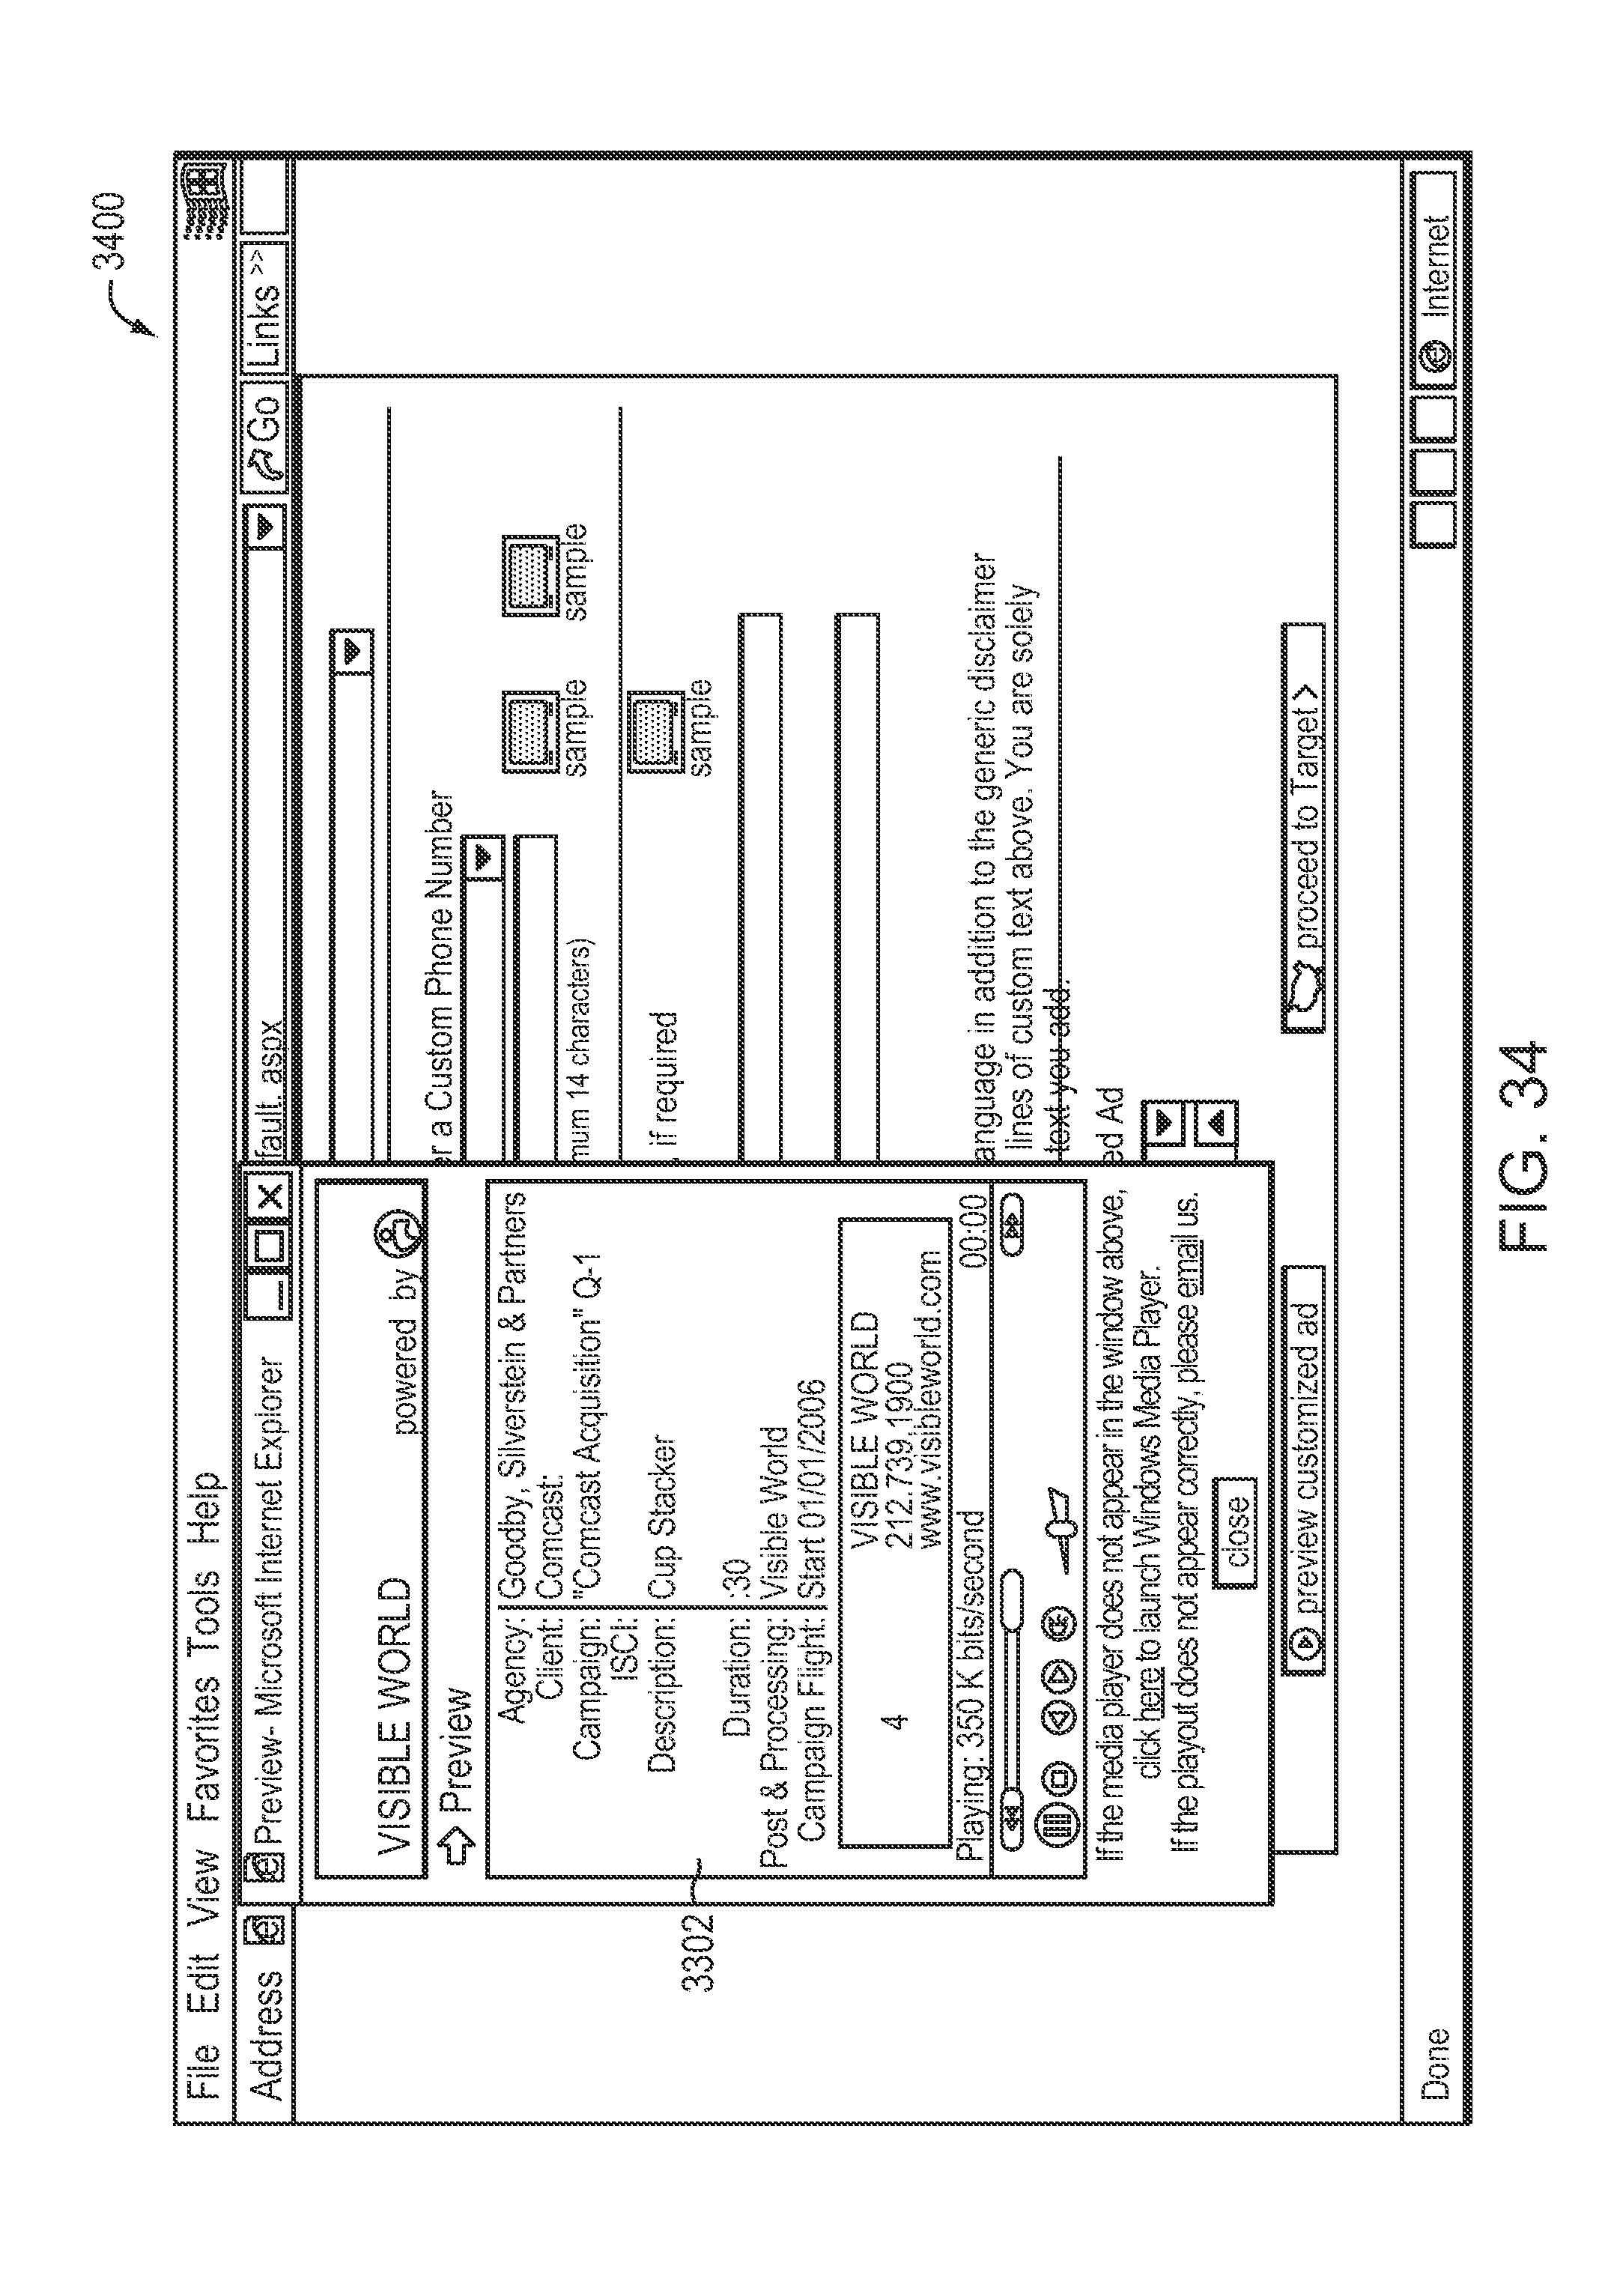 Patent US 7,895,620 B2